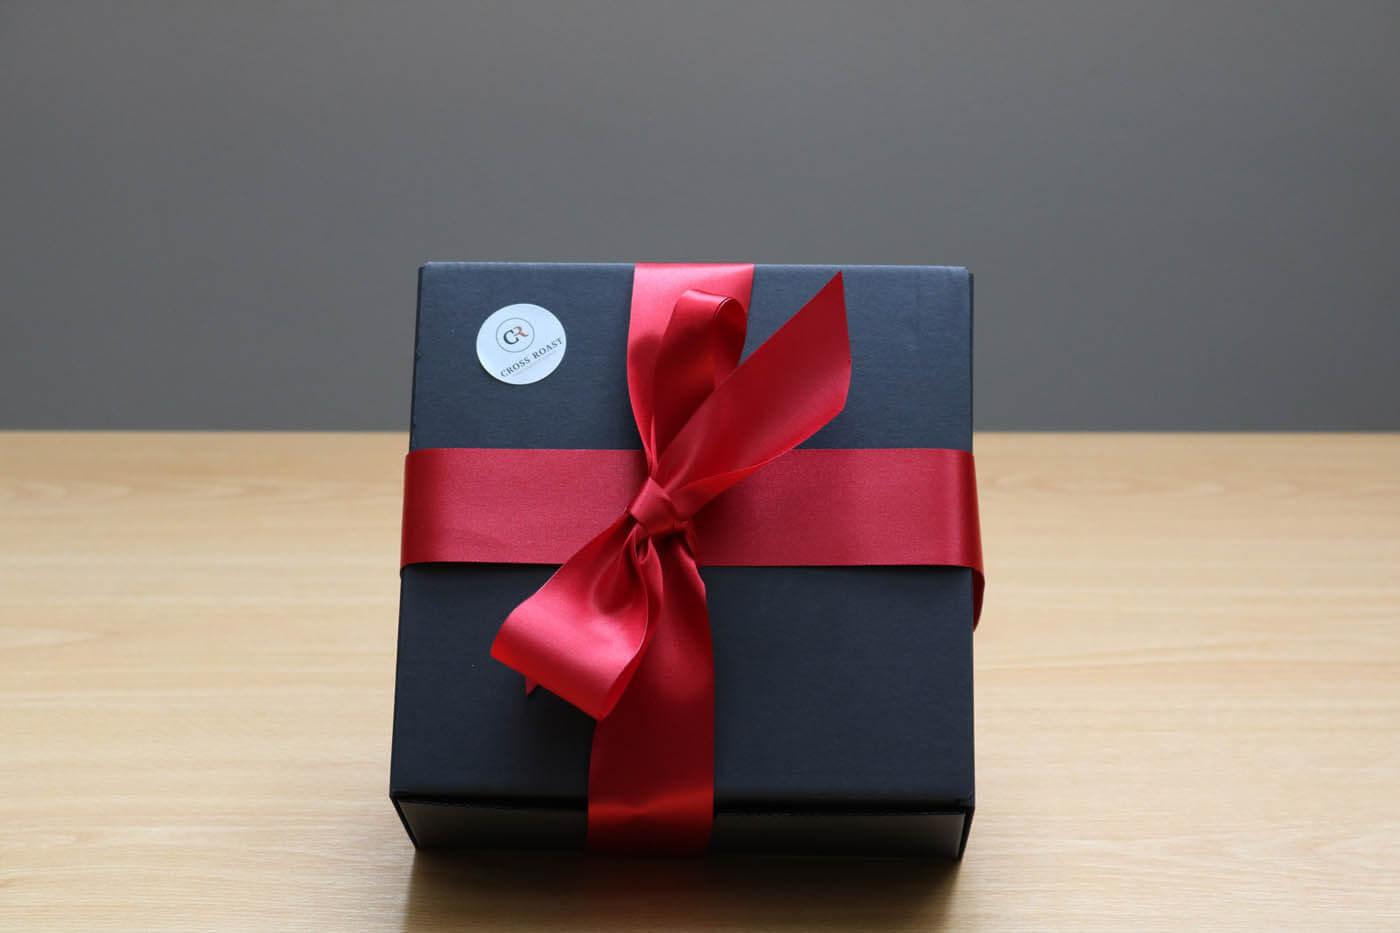 Verpakking Kerstpakketten